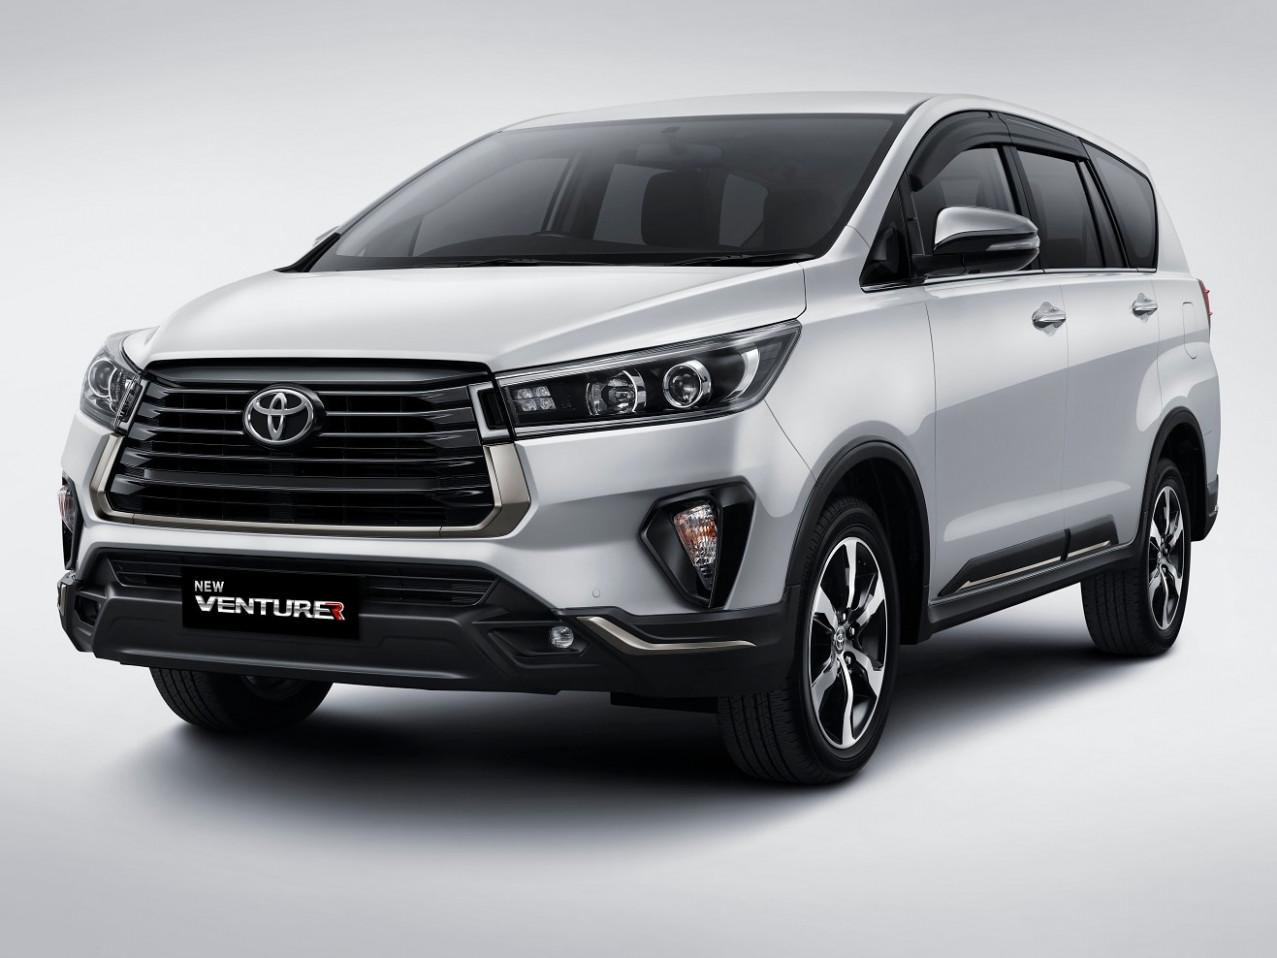 Concept Toyota Innova Crysta Facelift 2022